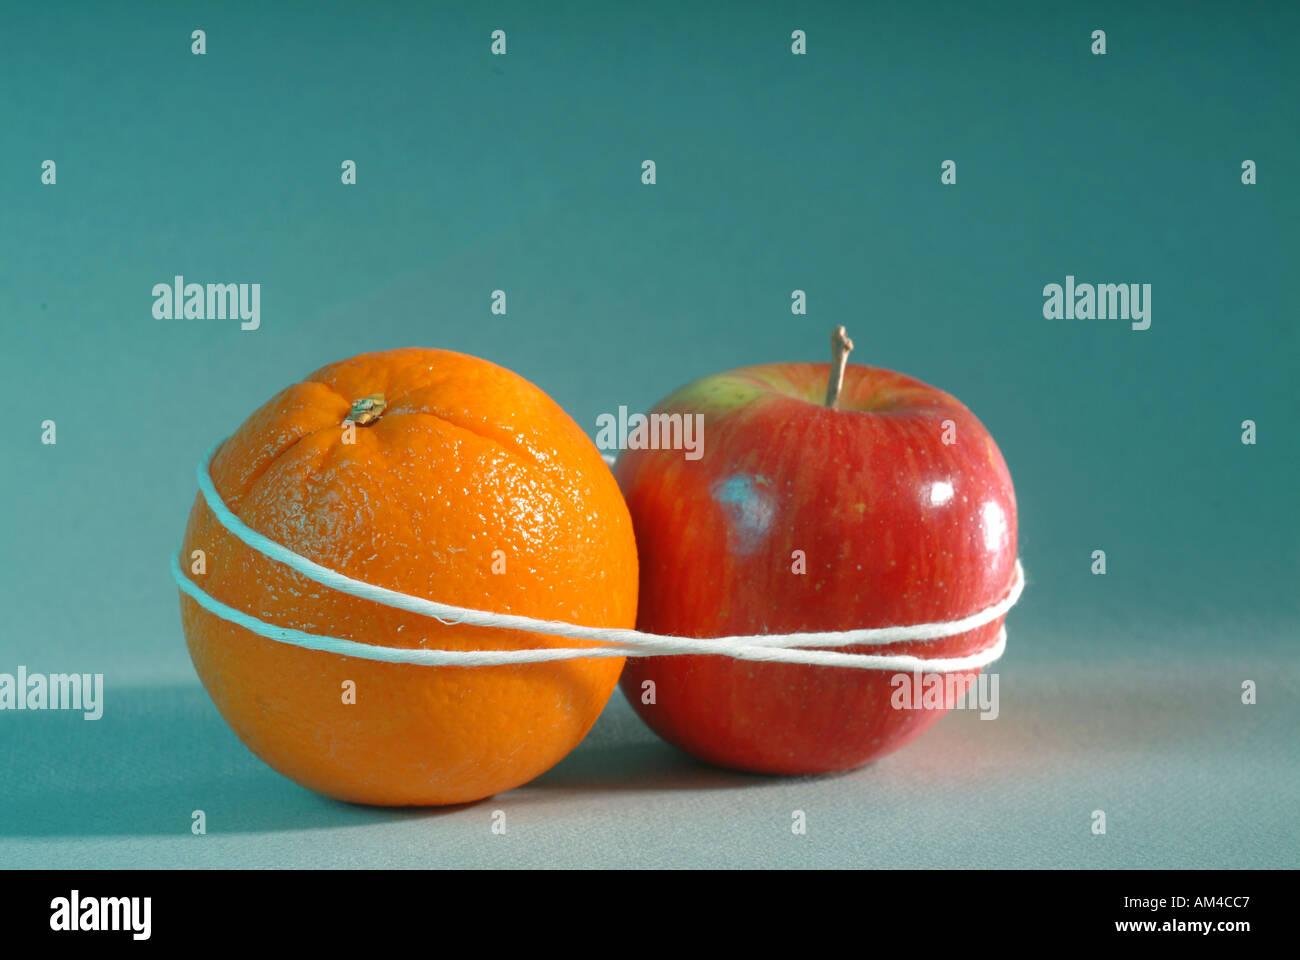 Apple e Orange legati insieme dimostrando opposti Immagini Stock